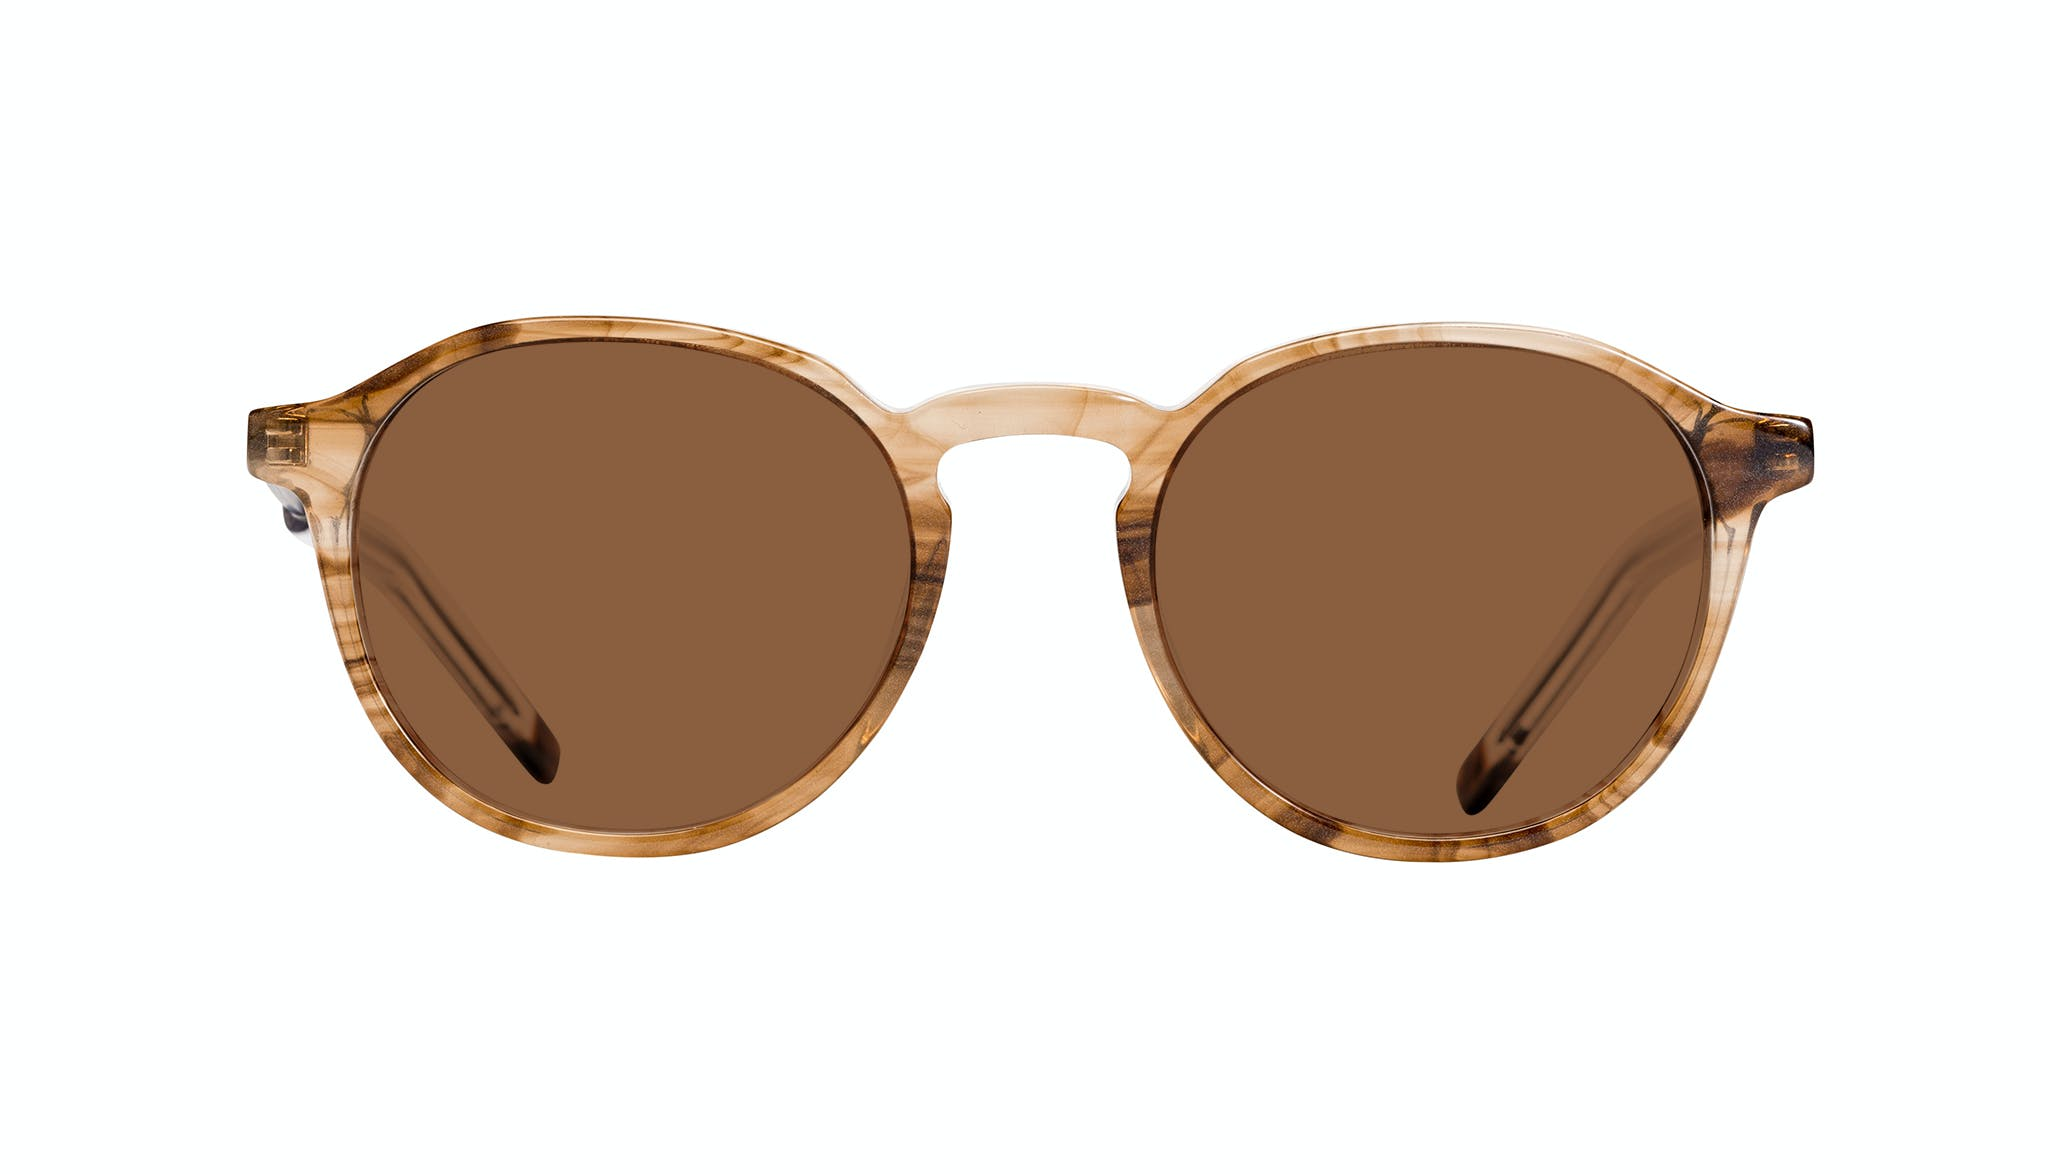 Affordable Fashion Glasses Round Sunglasses Men Prime Smokey Havana